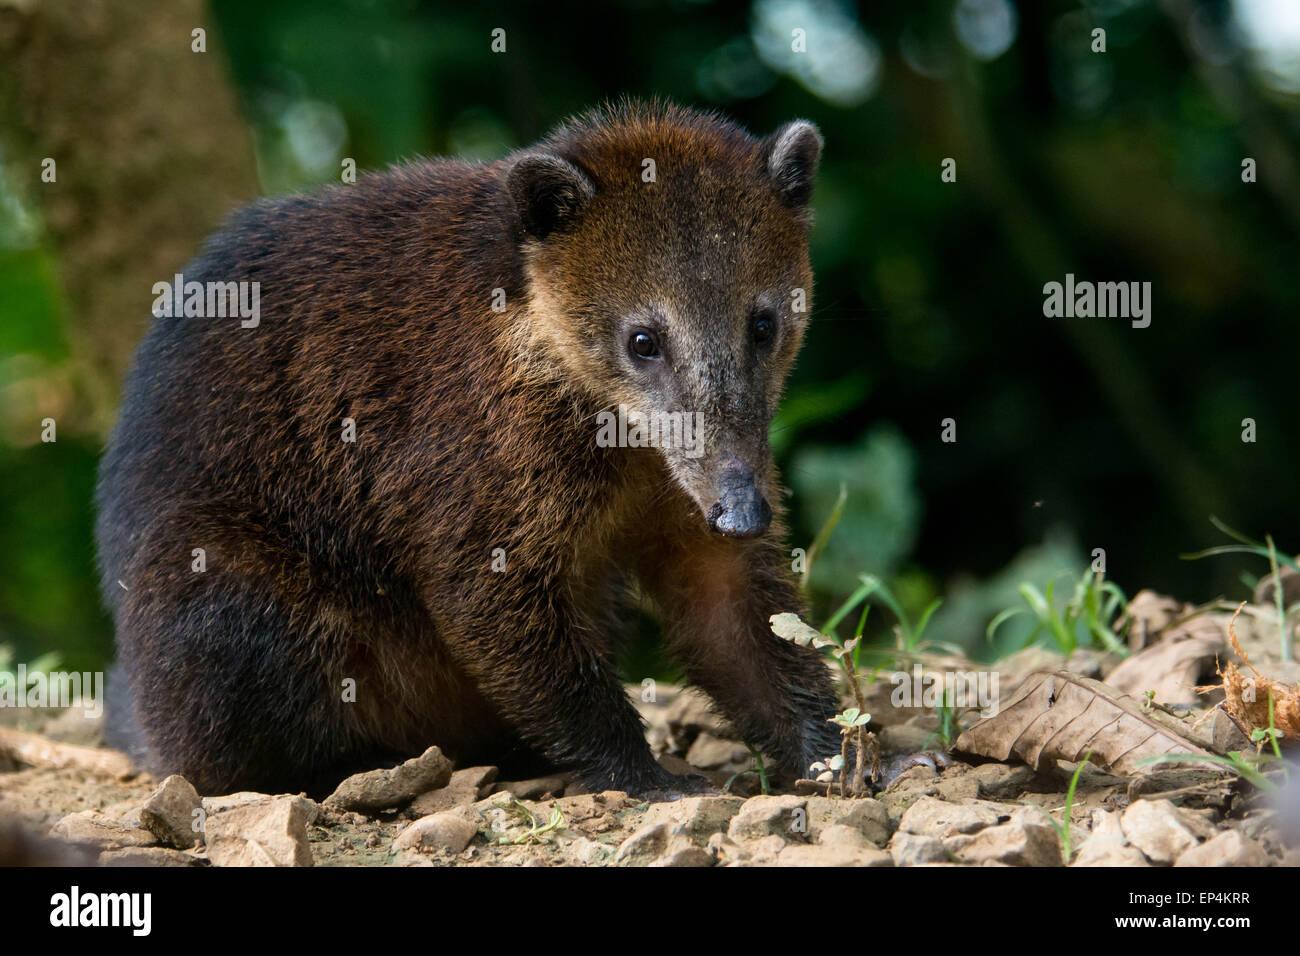 A South American Coati (Nasua nasua) looks curiously at the photographer in Buenaventura Reserve in southern Ecuador. - Stock Image